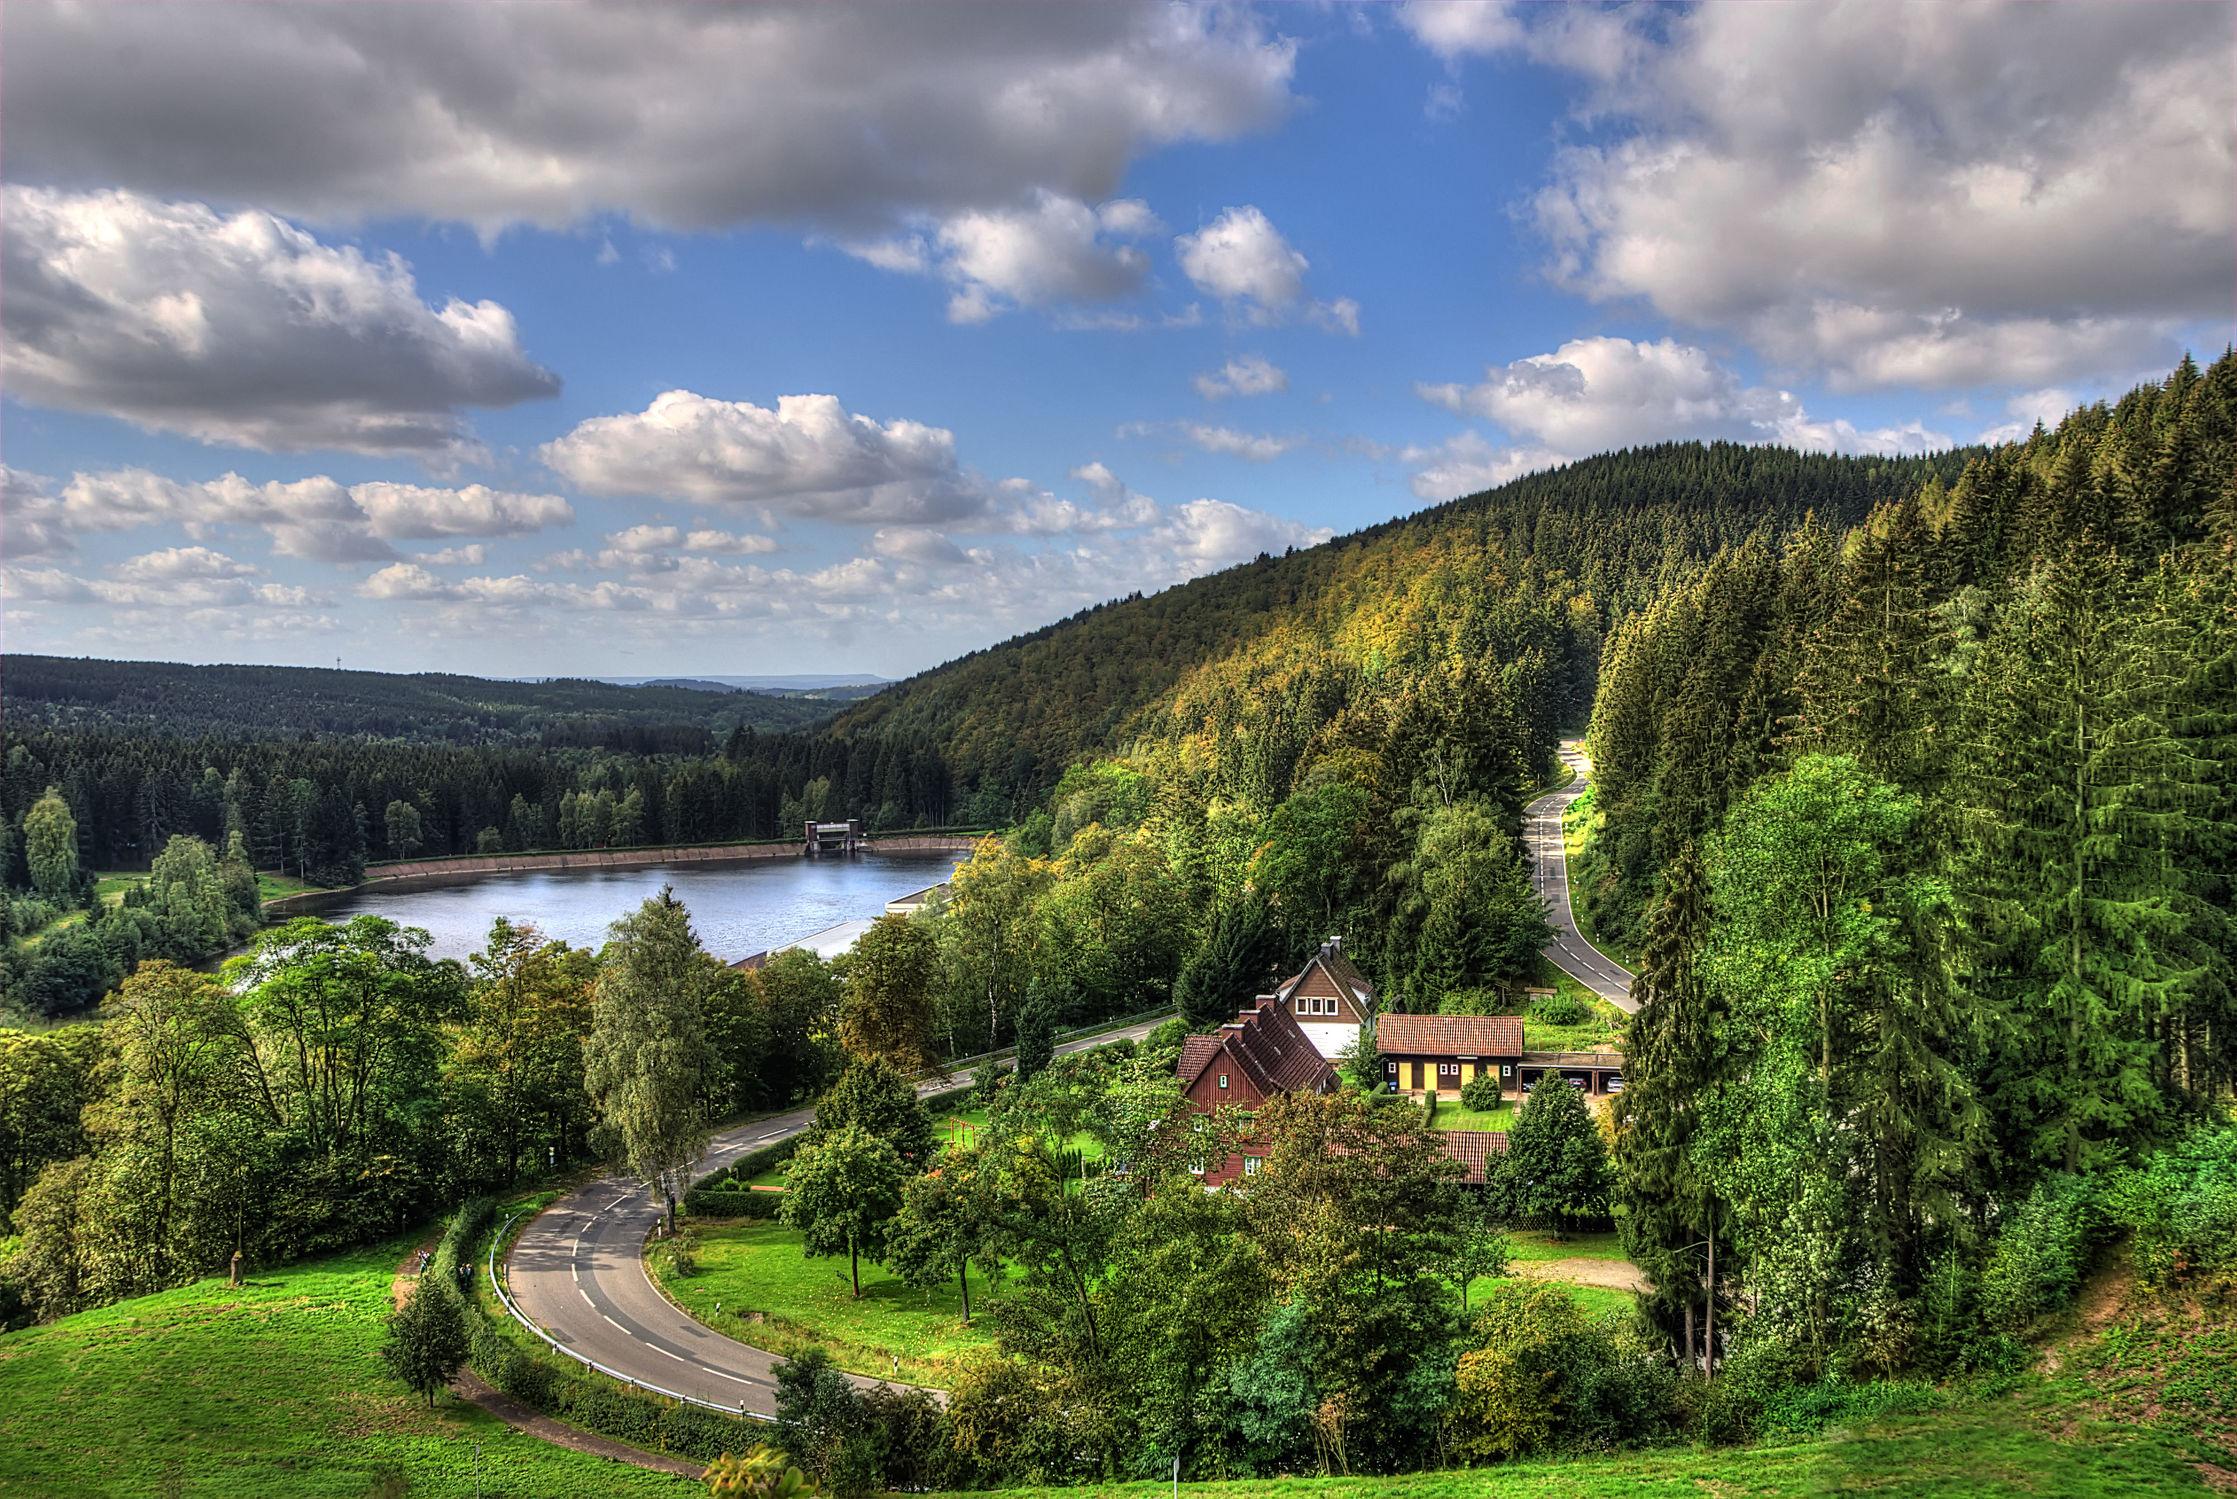 Bild mit Landschaften, Bäume, Wälder, Wege, Sonne, Wald, Baum, Weg, Landschaft, Wiese, Feld, Felder, Harz, Wiesen, Weide, Weiden, abenteuer, tal